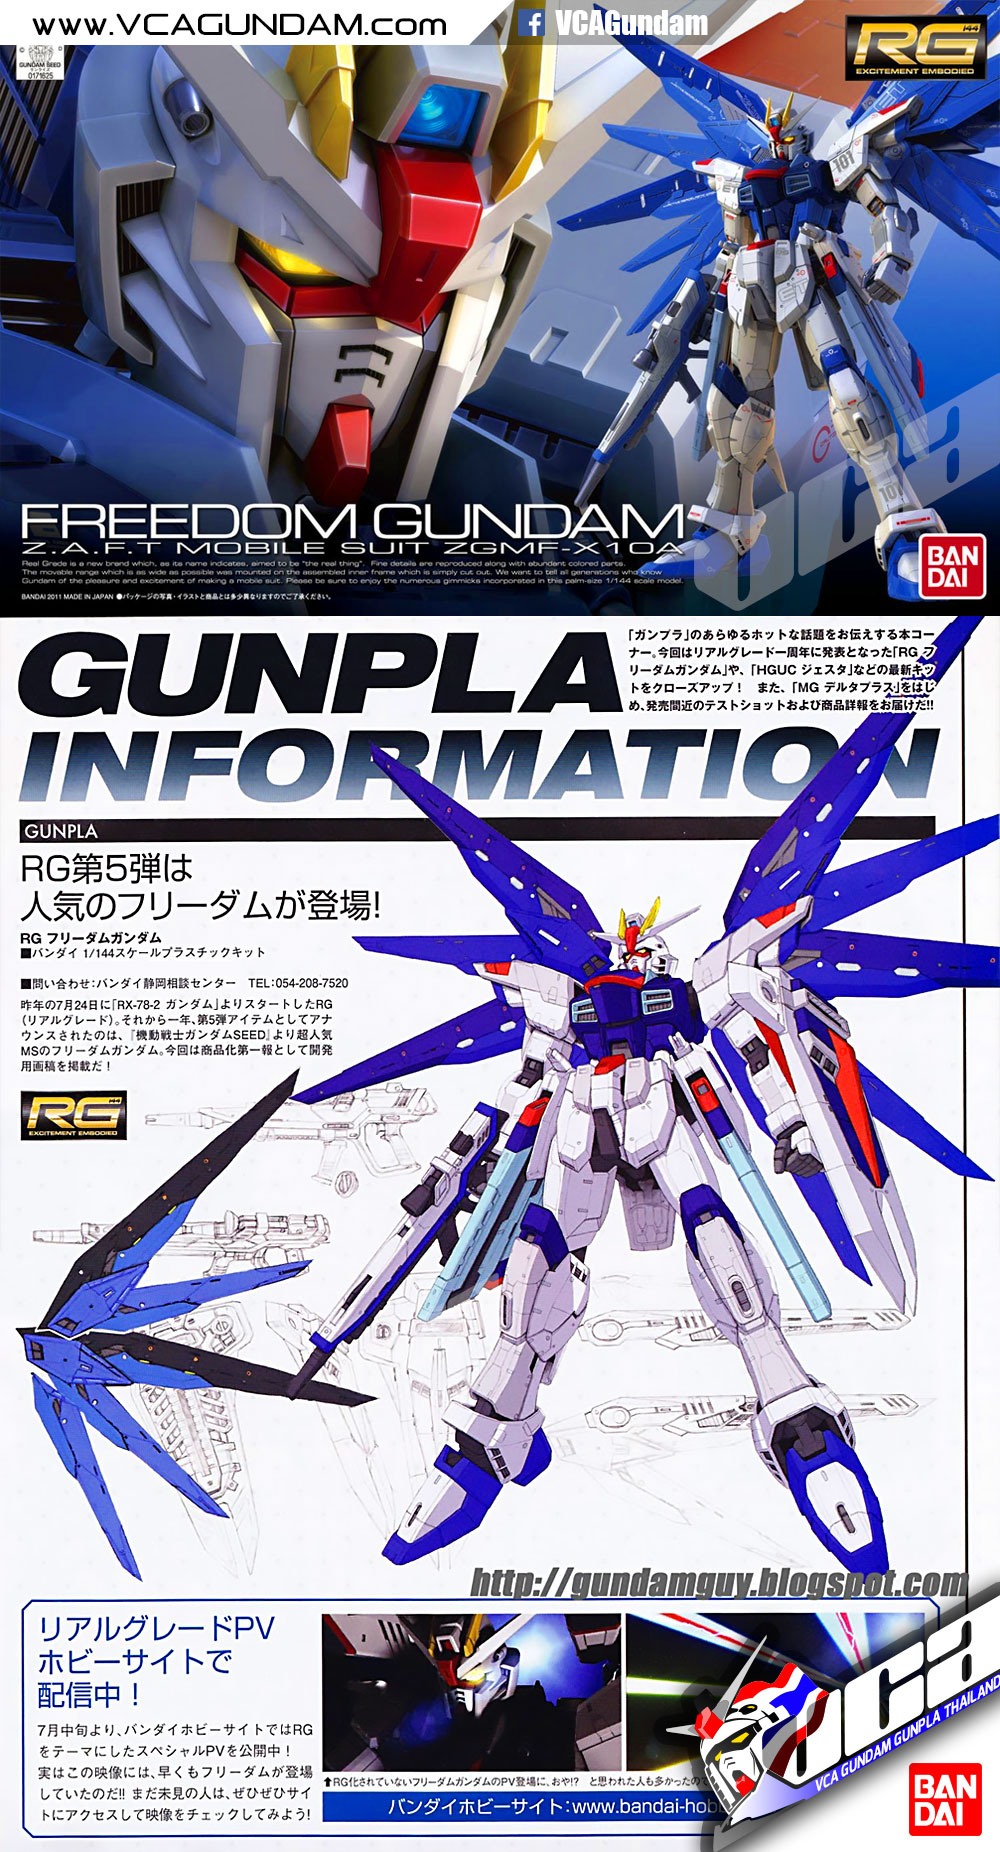 RG FREEDOM GUNDAM ฟรีดอม กันดั้ม